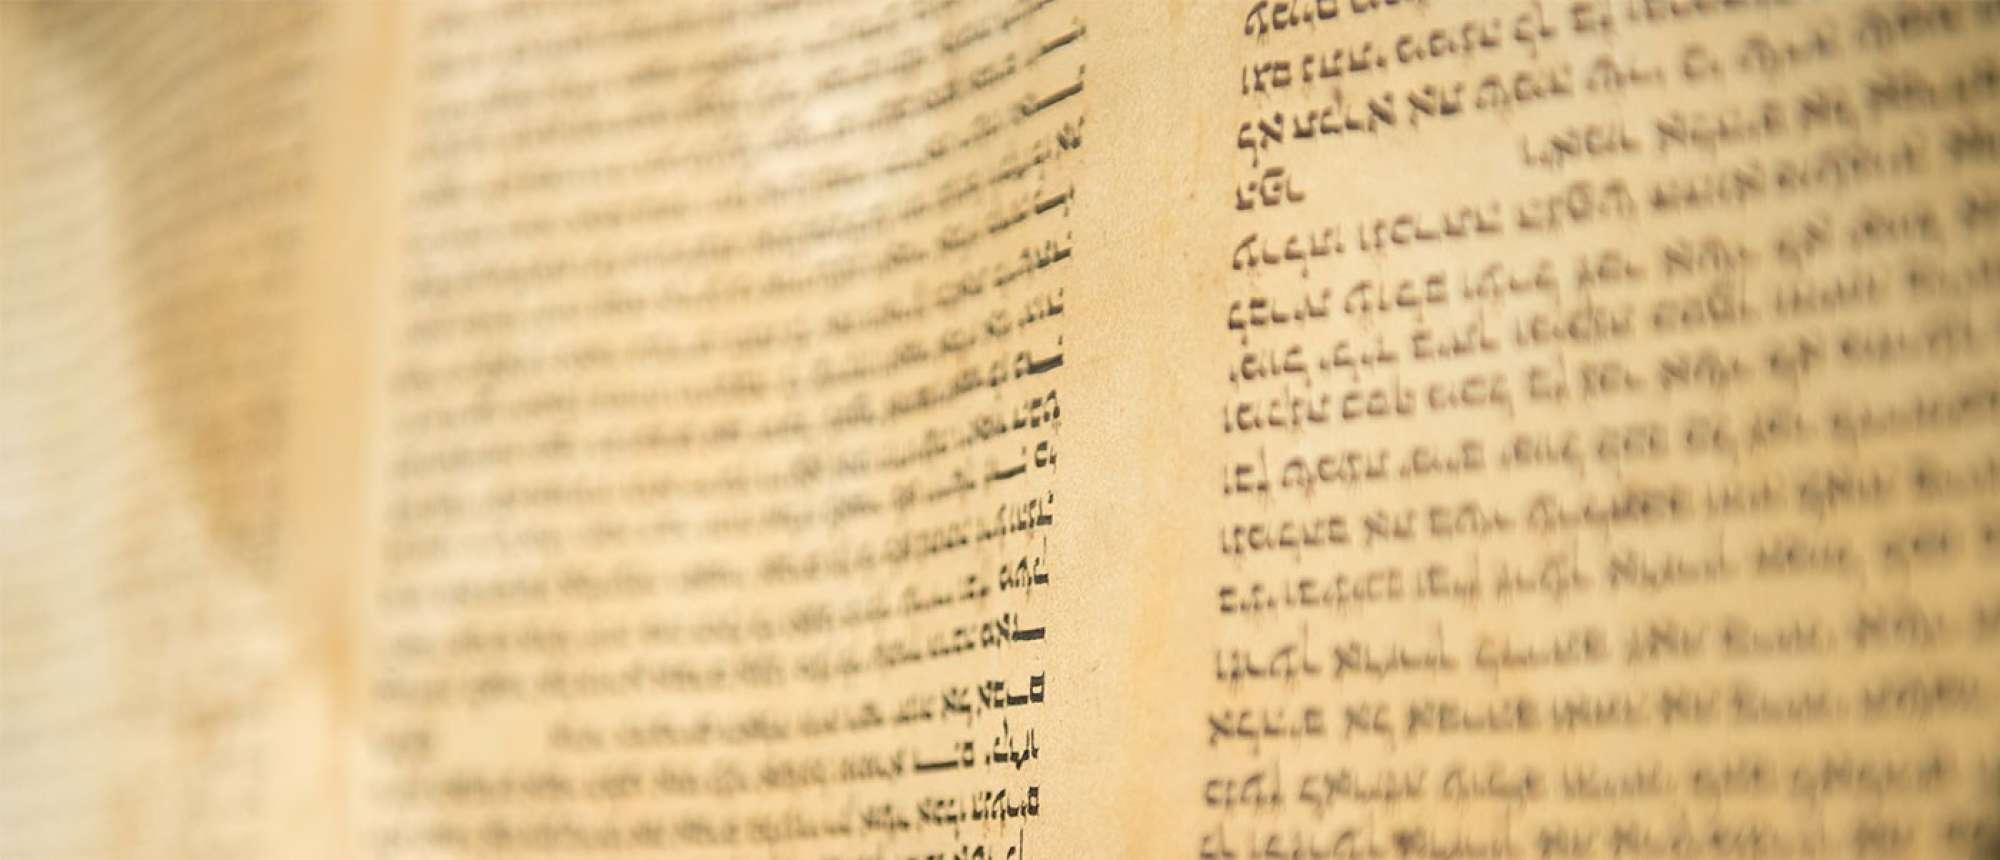 Upclose of world languages textbook